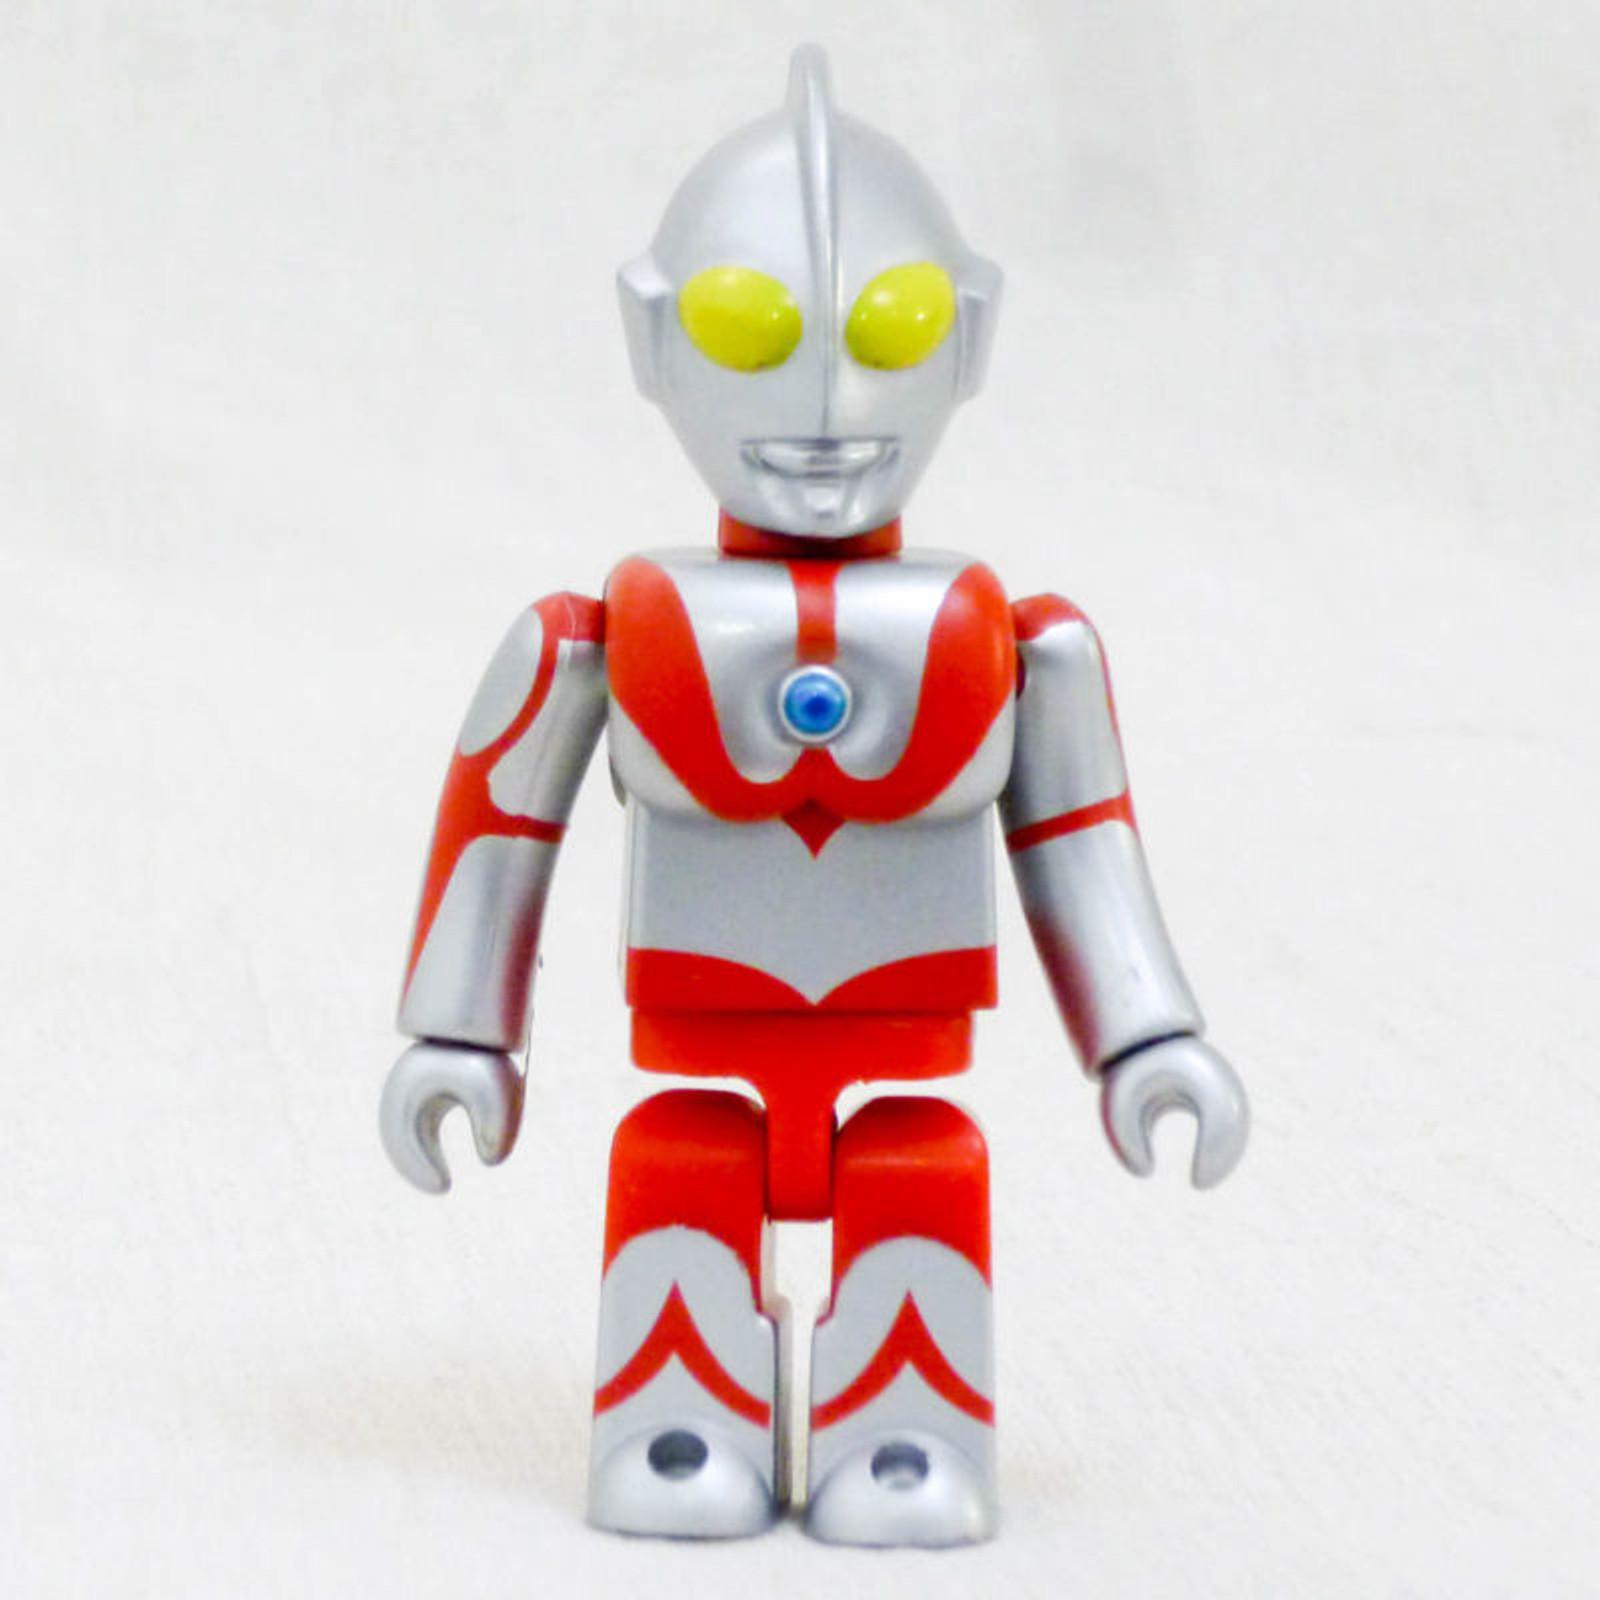 Ultraman Kubrick Series Medicom Toy JAPAN FIGURE TOKUSATSU ANIME